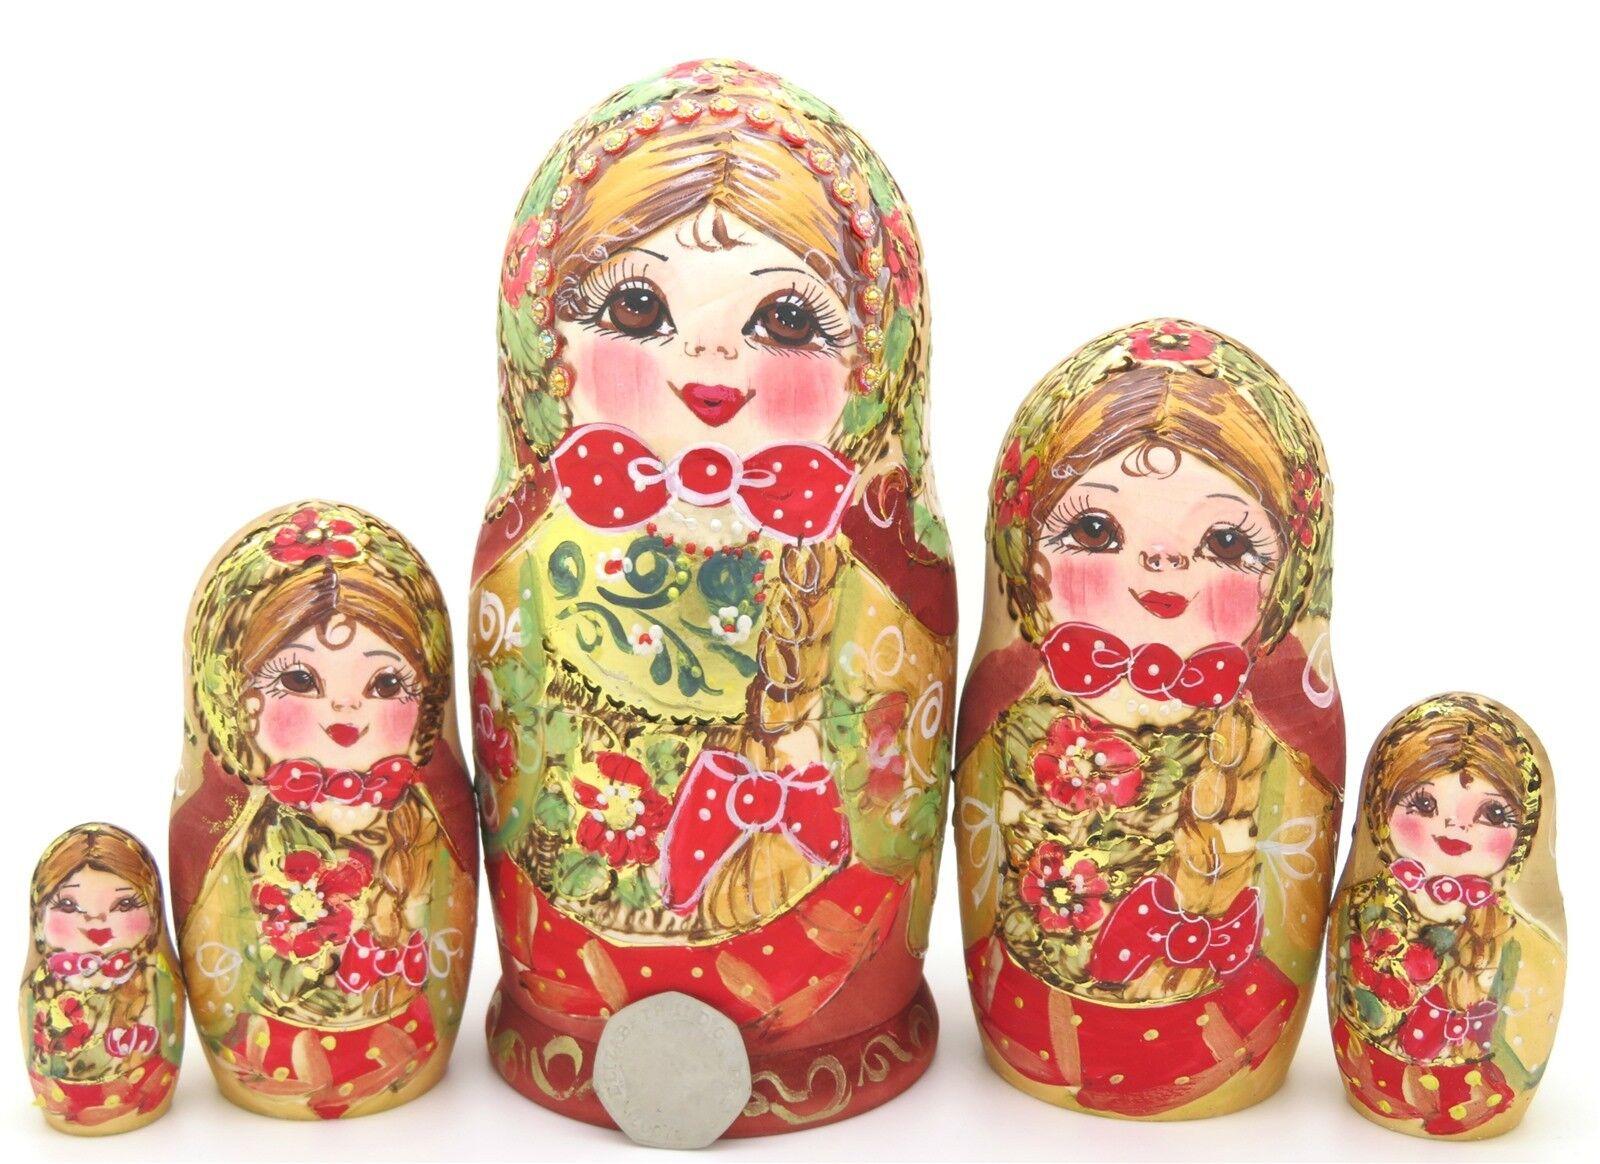 Matryoshka GOLD ROT Russian nesting dolls HAND PAINTED Pyrography Babushka 5